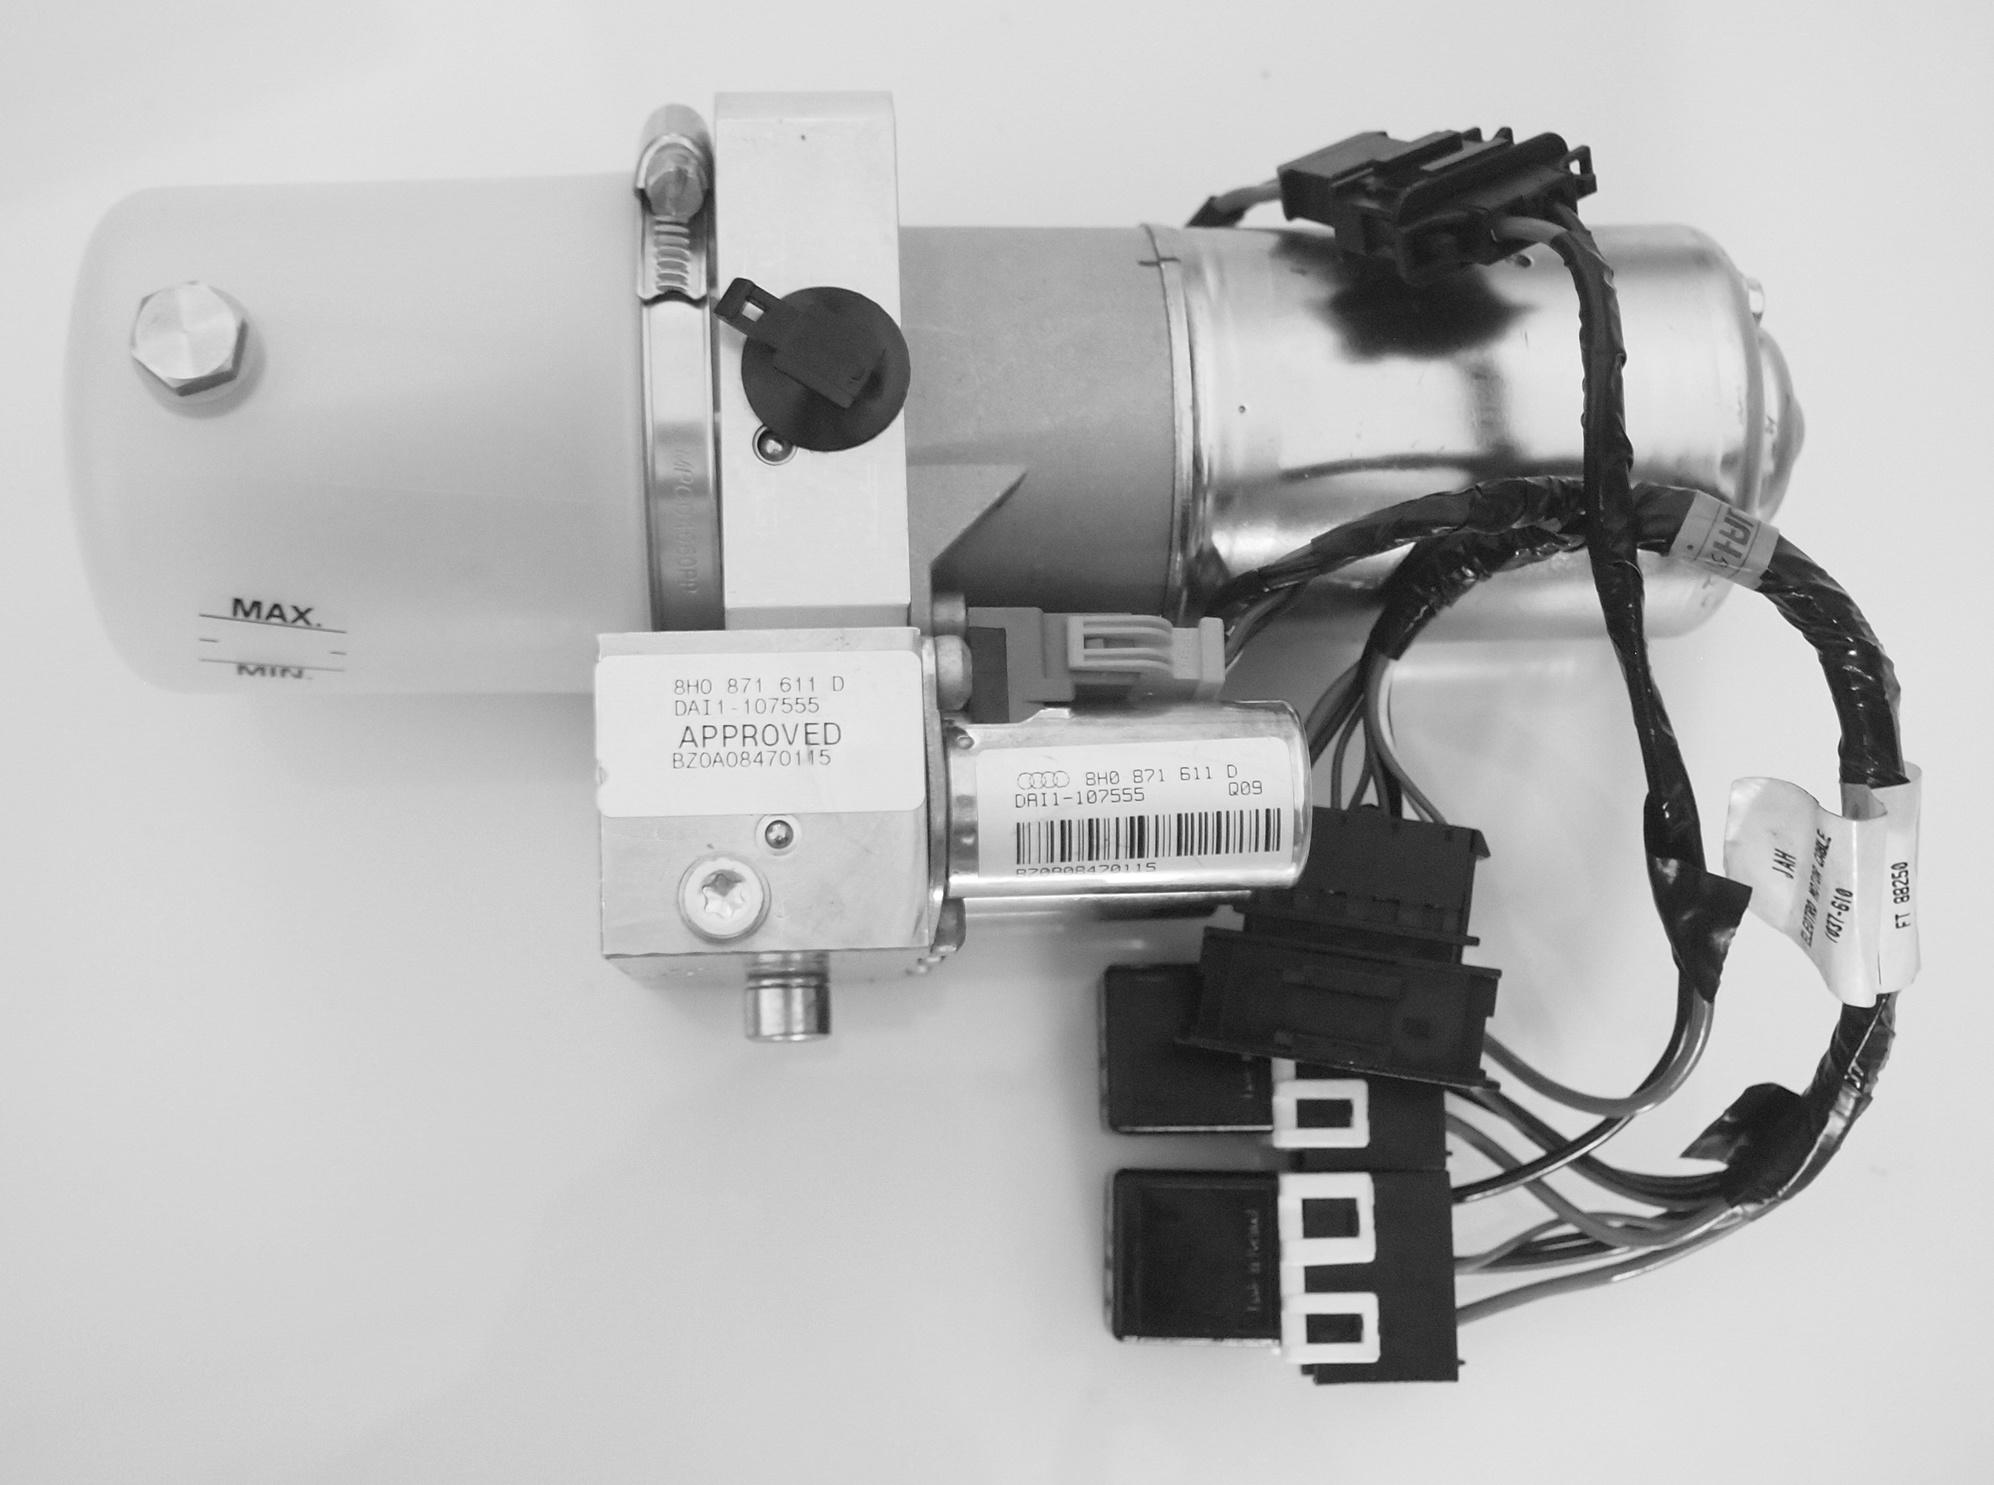 A4 pump with valve block